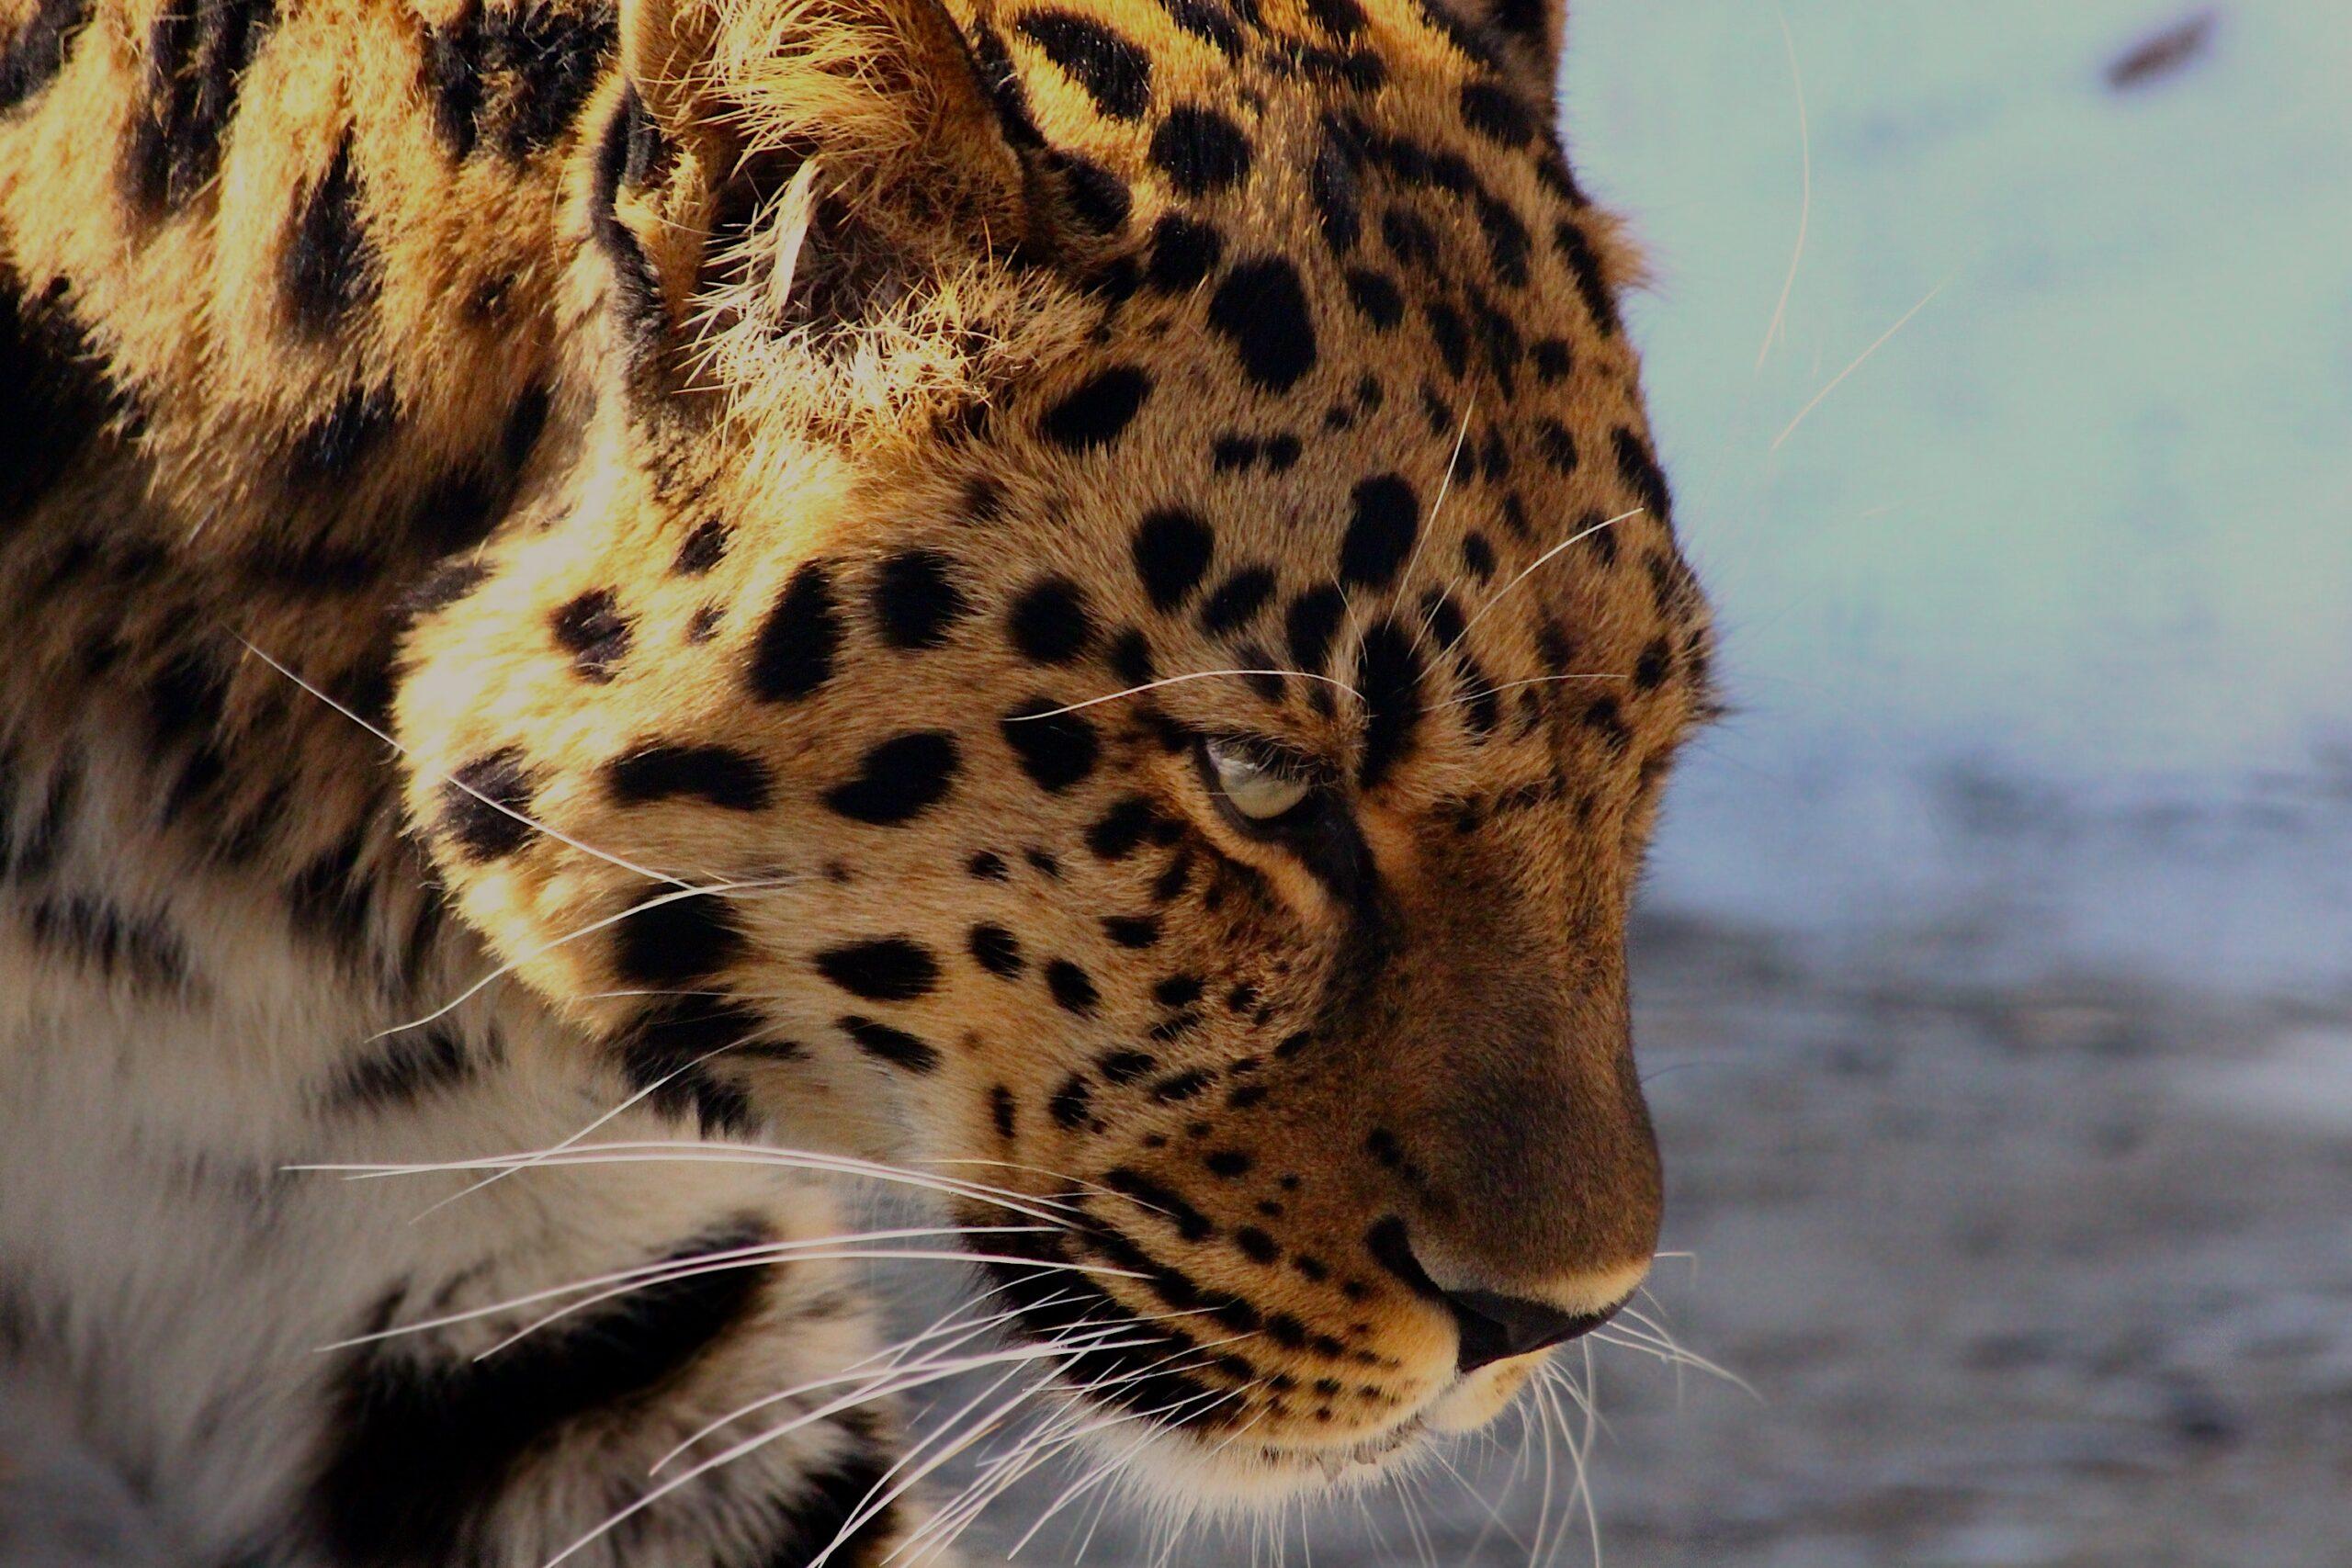 Can a Leopard Change its Spots?